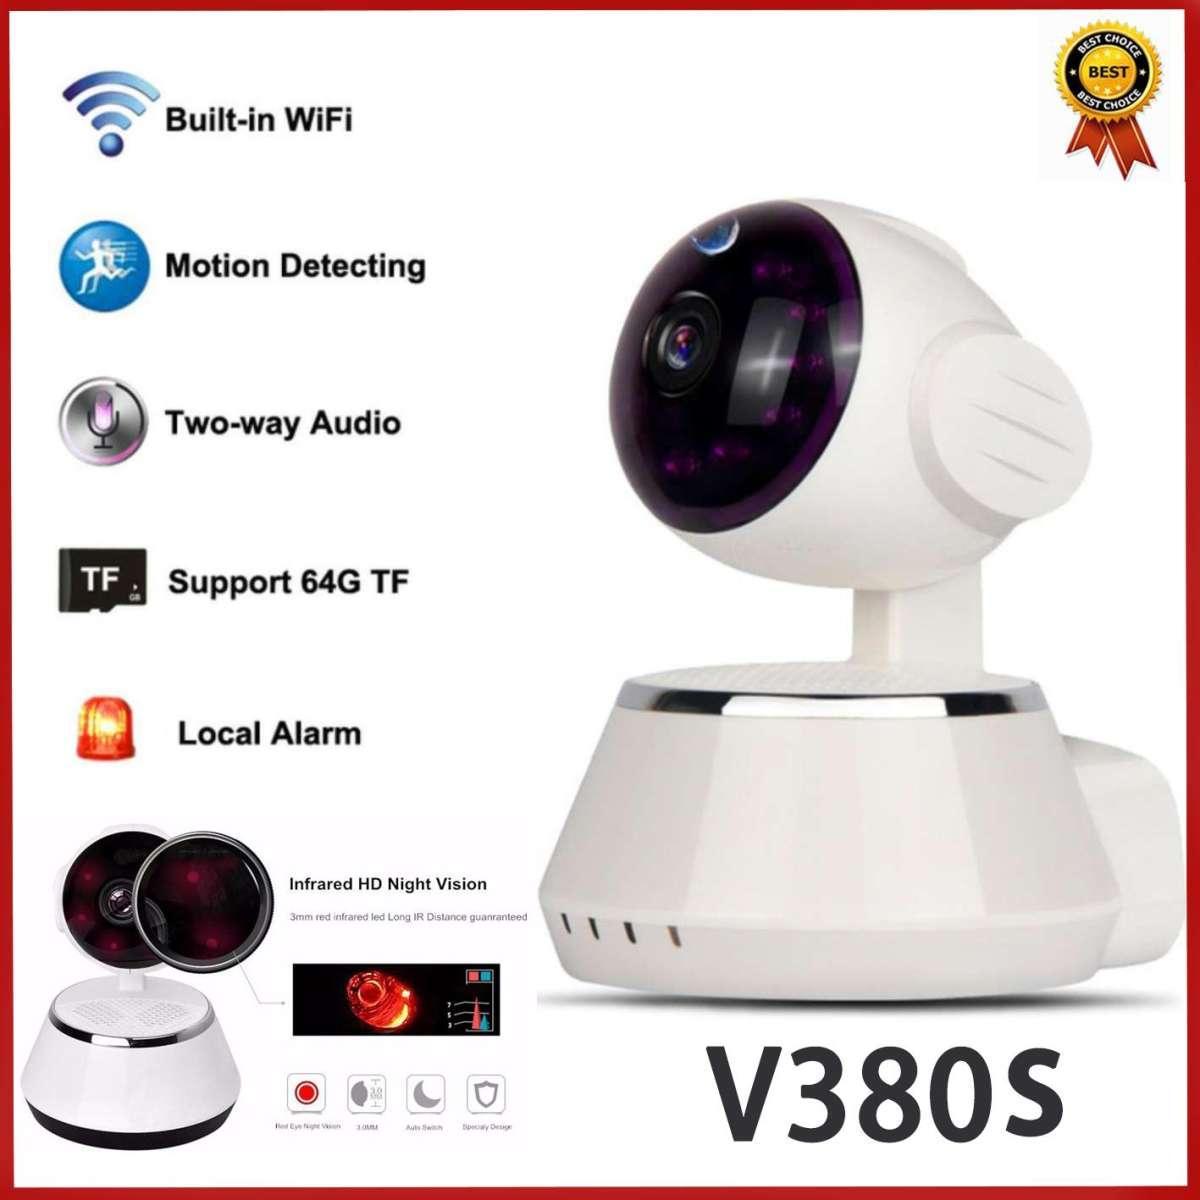 V380s CCTV 1080P CCTV HD WiFi Wireless IP Camera Two Way Audio